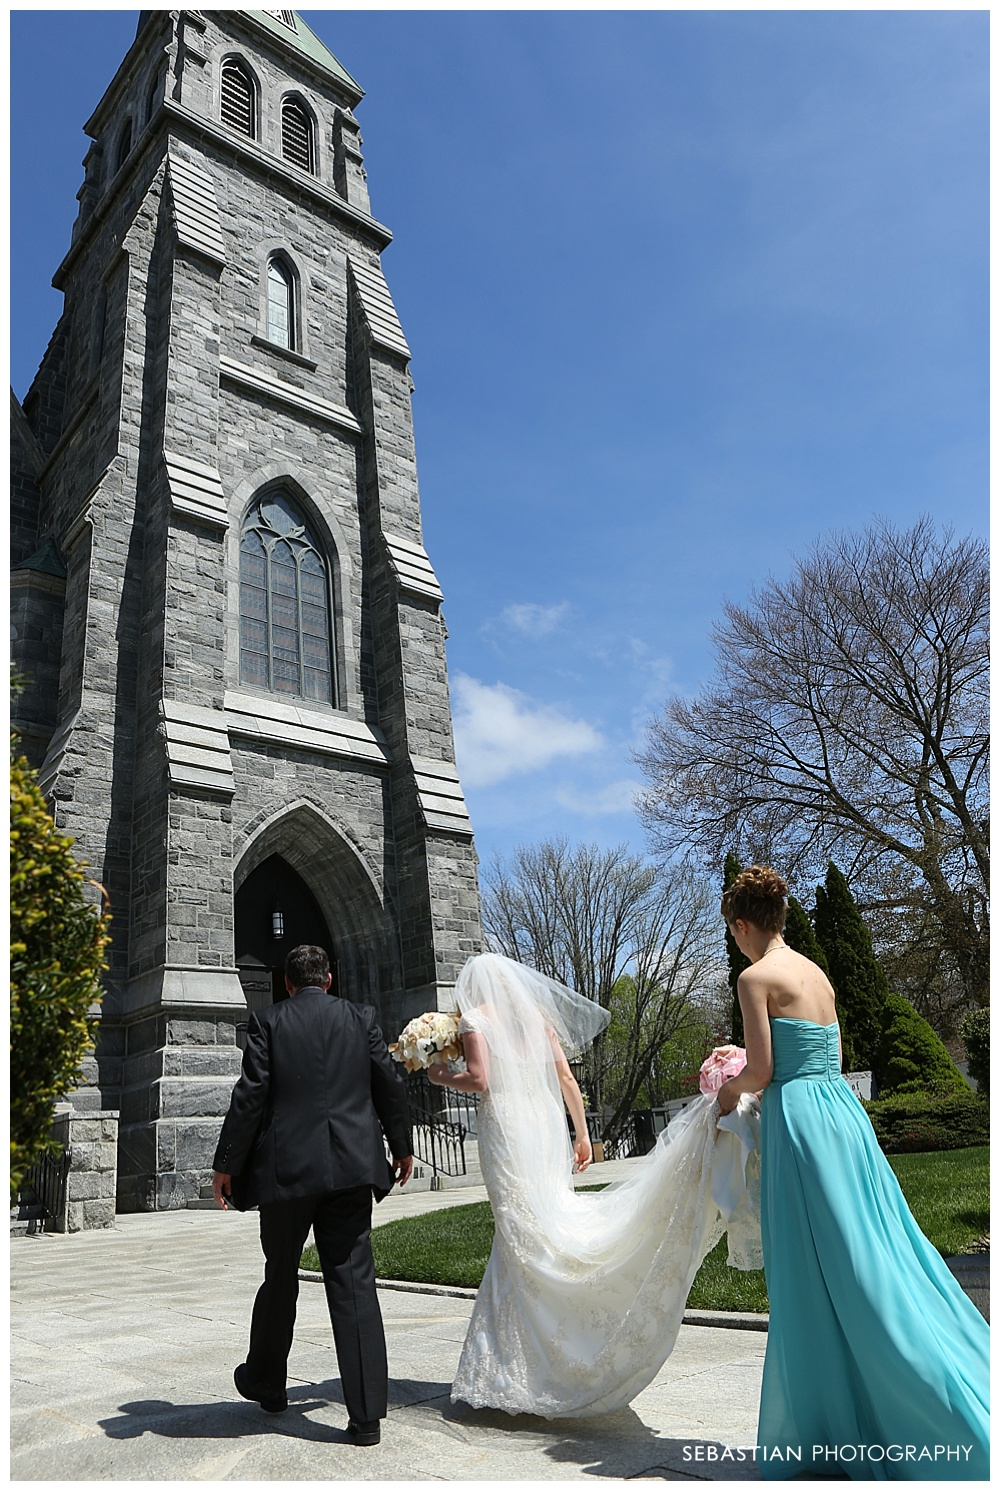 Sebastian_Photography_Lake_Of_Isles_NorthStonington_CT_Wedding_Pictures_13.jpg